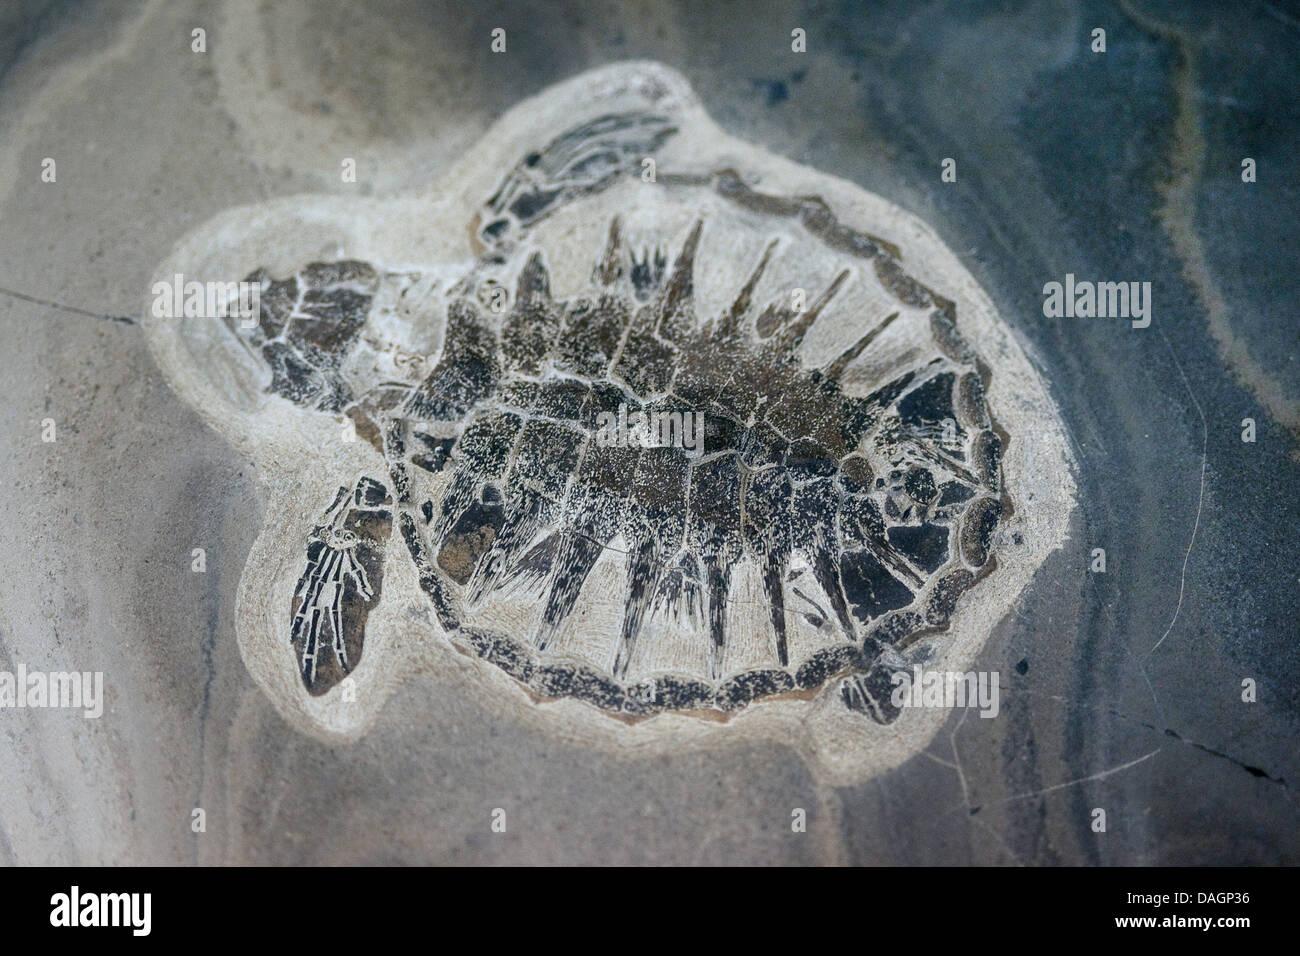 fossilized plant from Fur Formation, palaeocene/eocene, Denmark, Limfjord Stock Photo